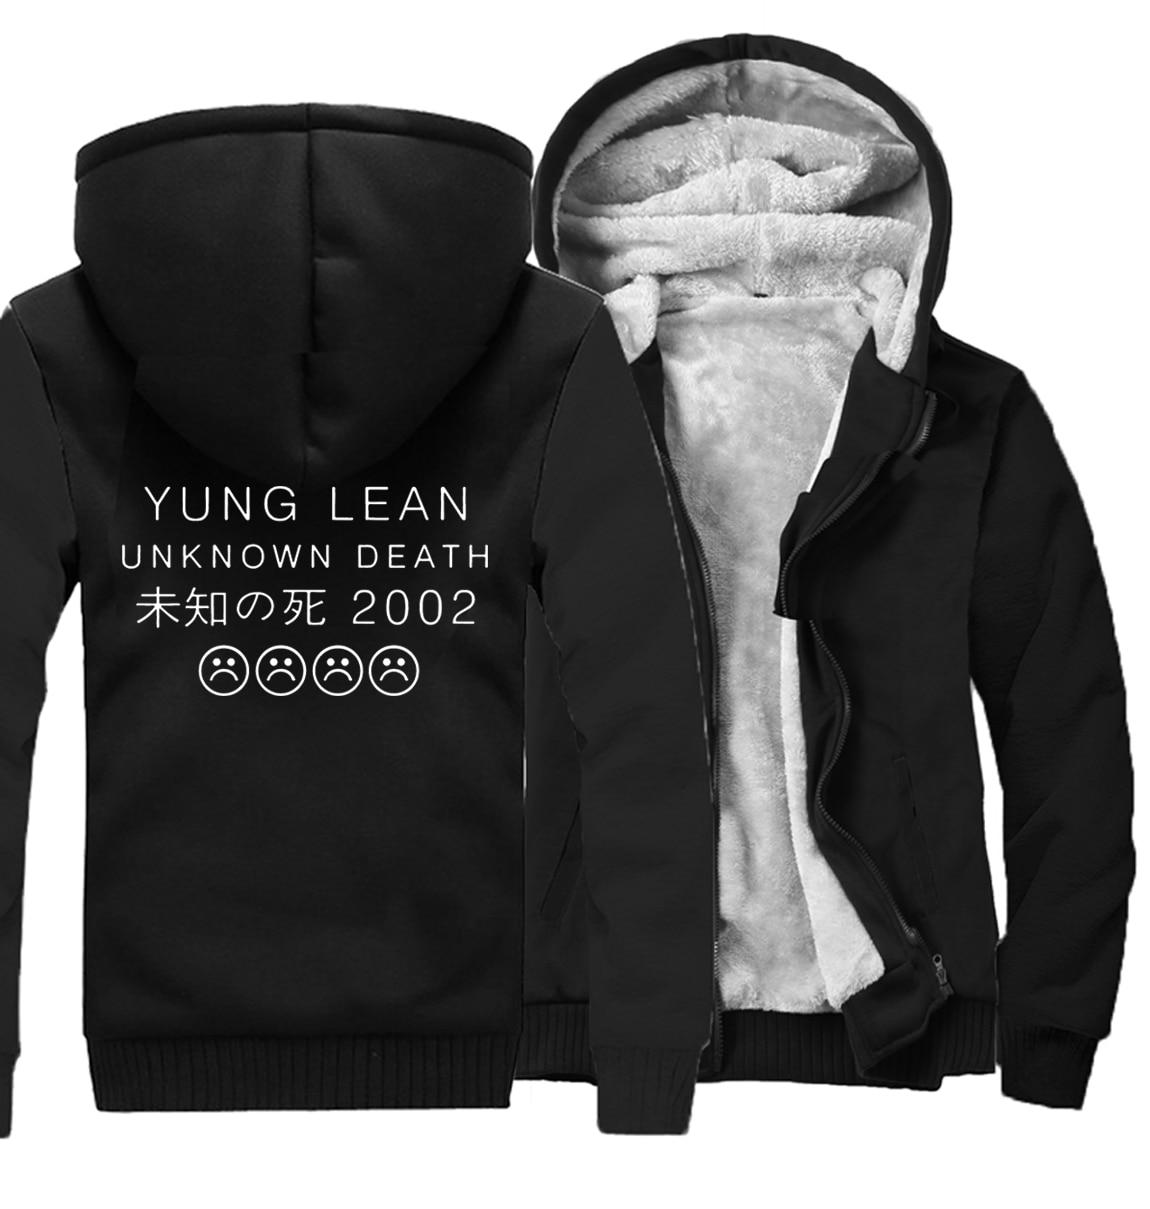 YUNY Men Tops High Neck Pure Color Fall//Winter Stylish T Shirts Dark Grey 2XL